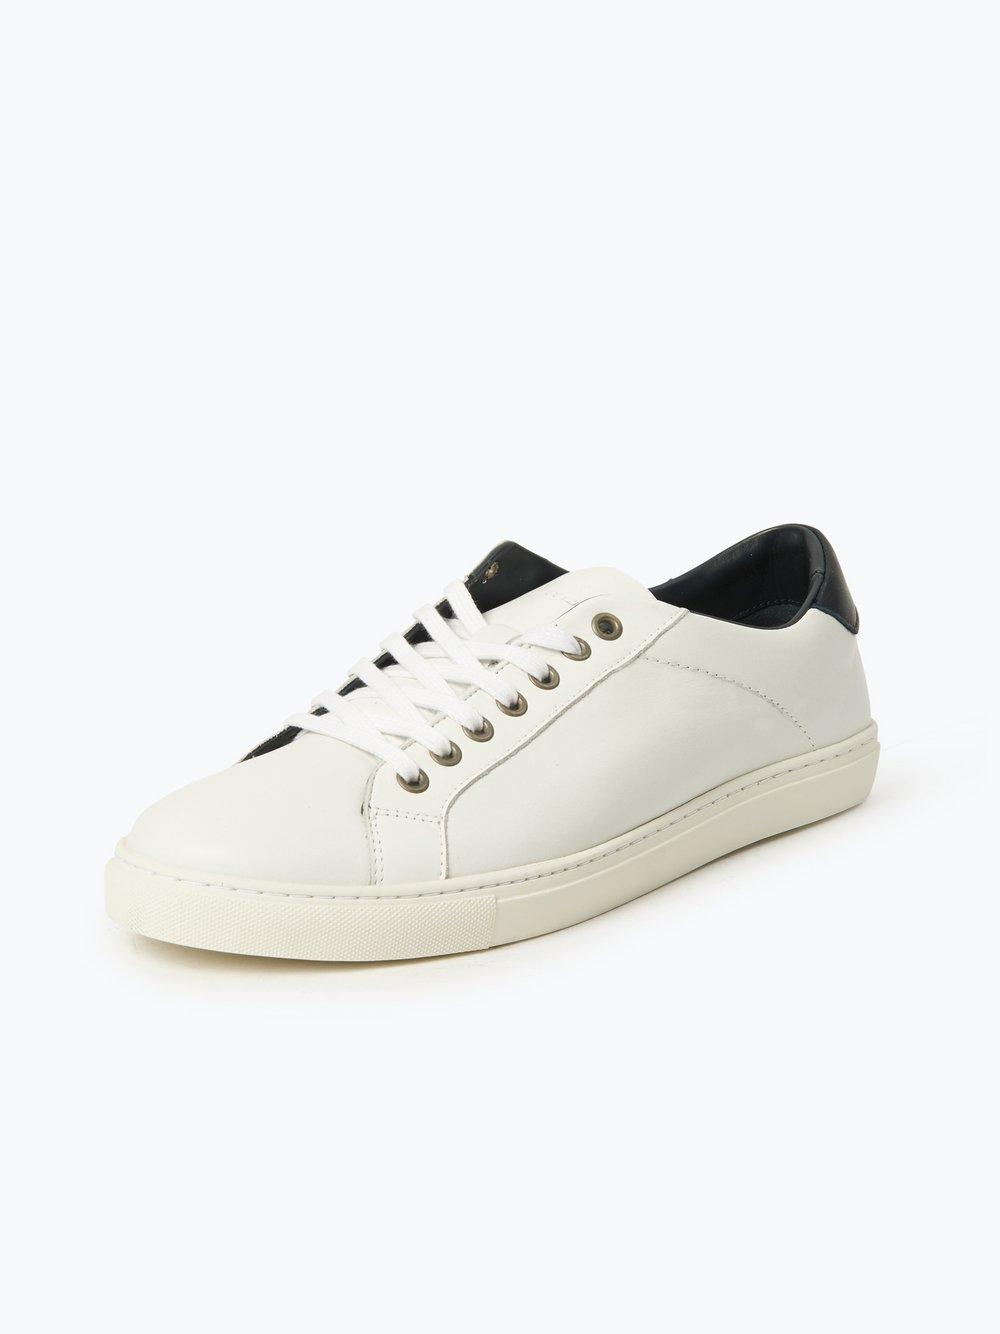 Tommy Hilfiger Herren Sneaker aus Leder - Mount 4A1 online kaufen ... f83e3f985f